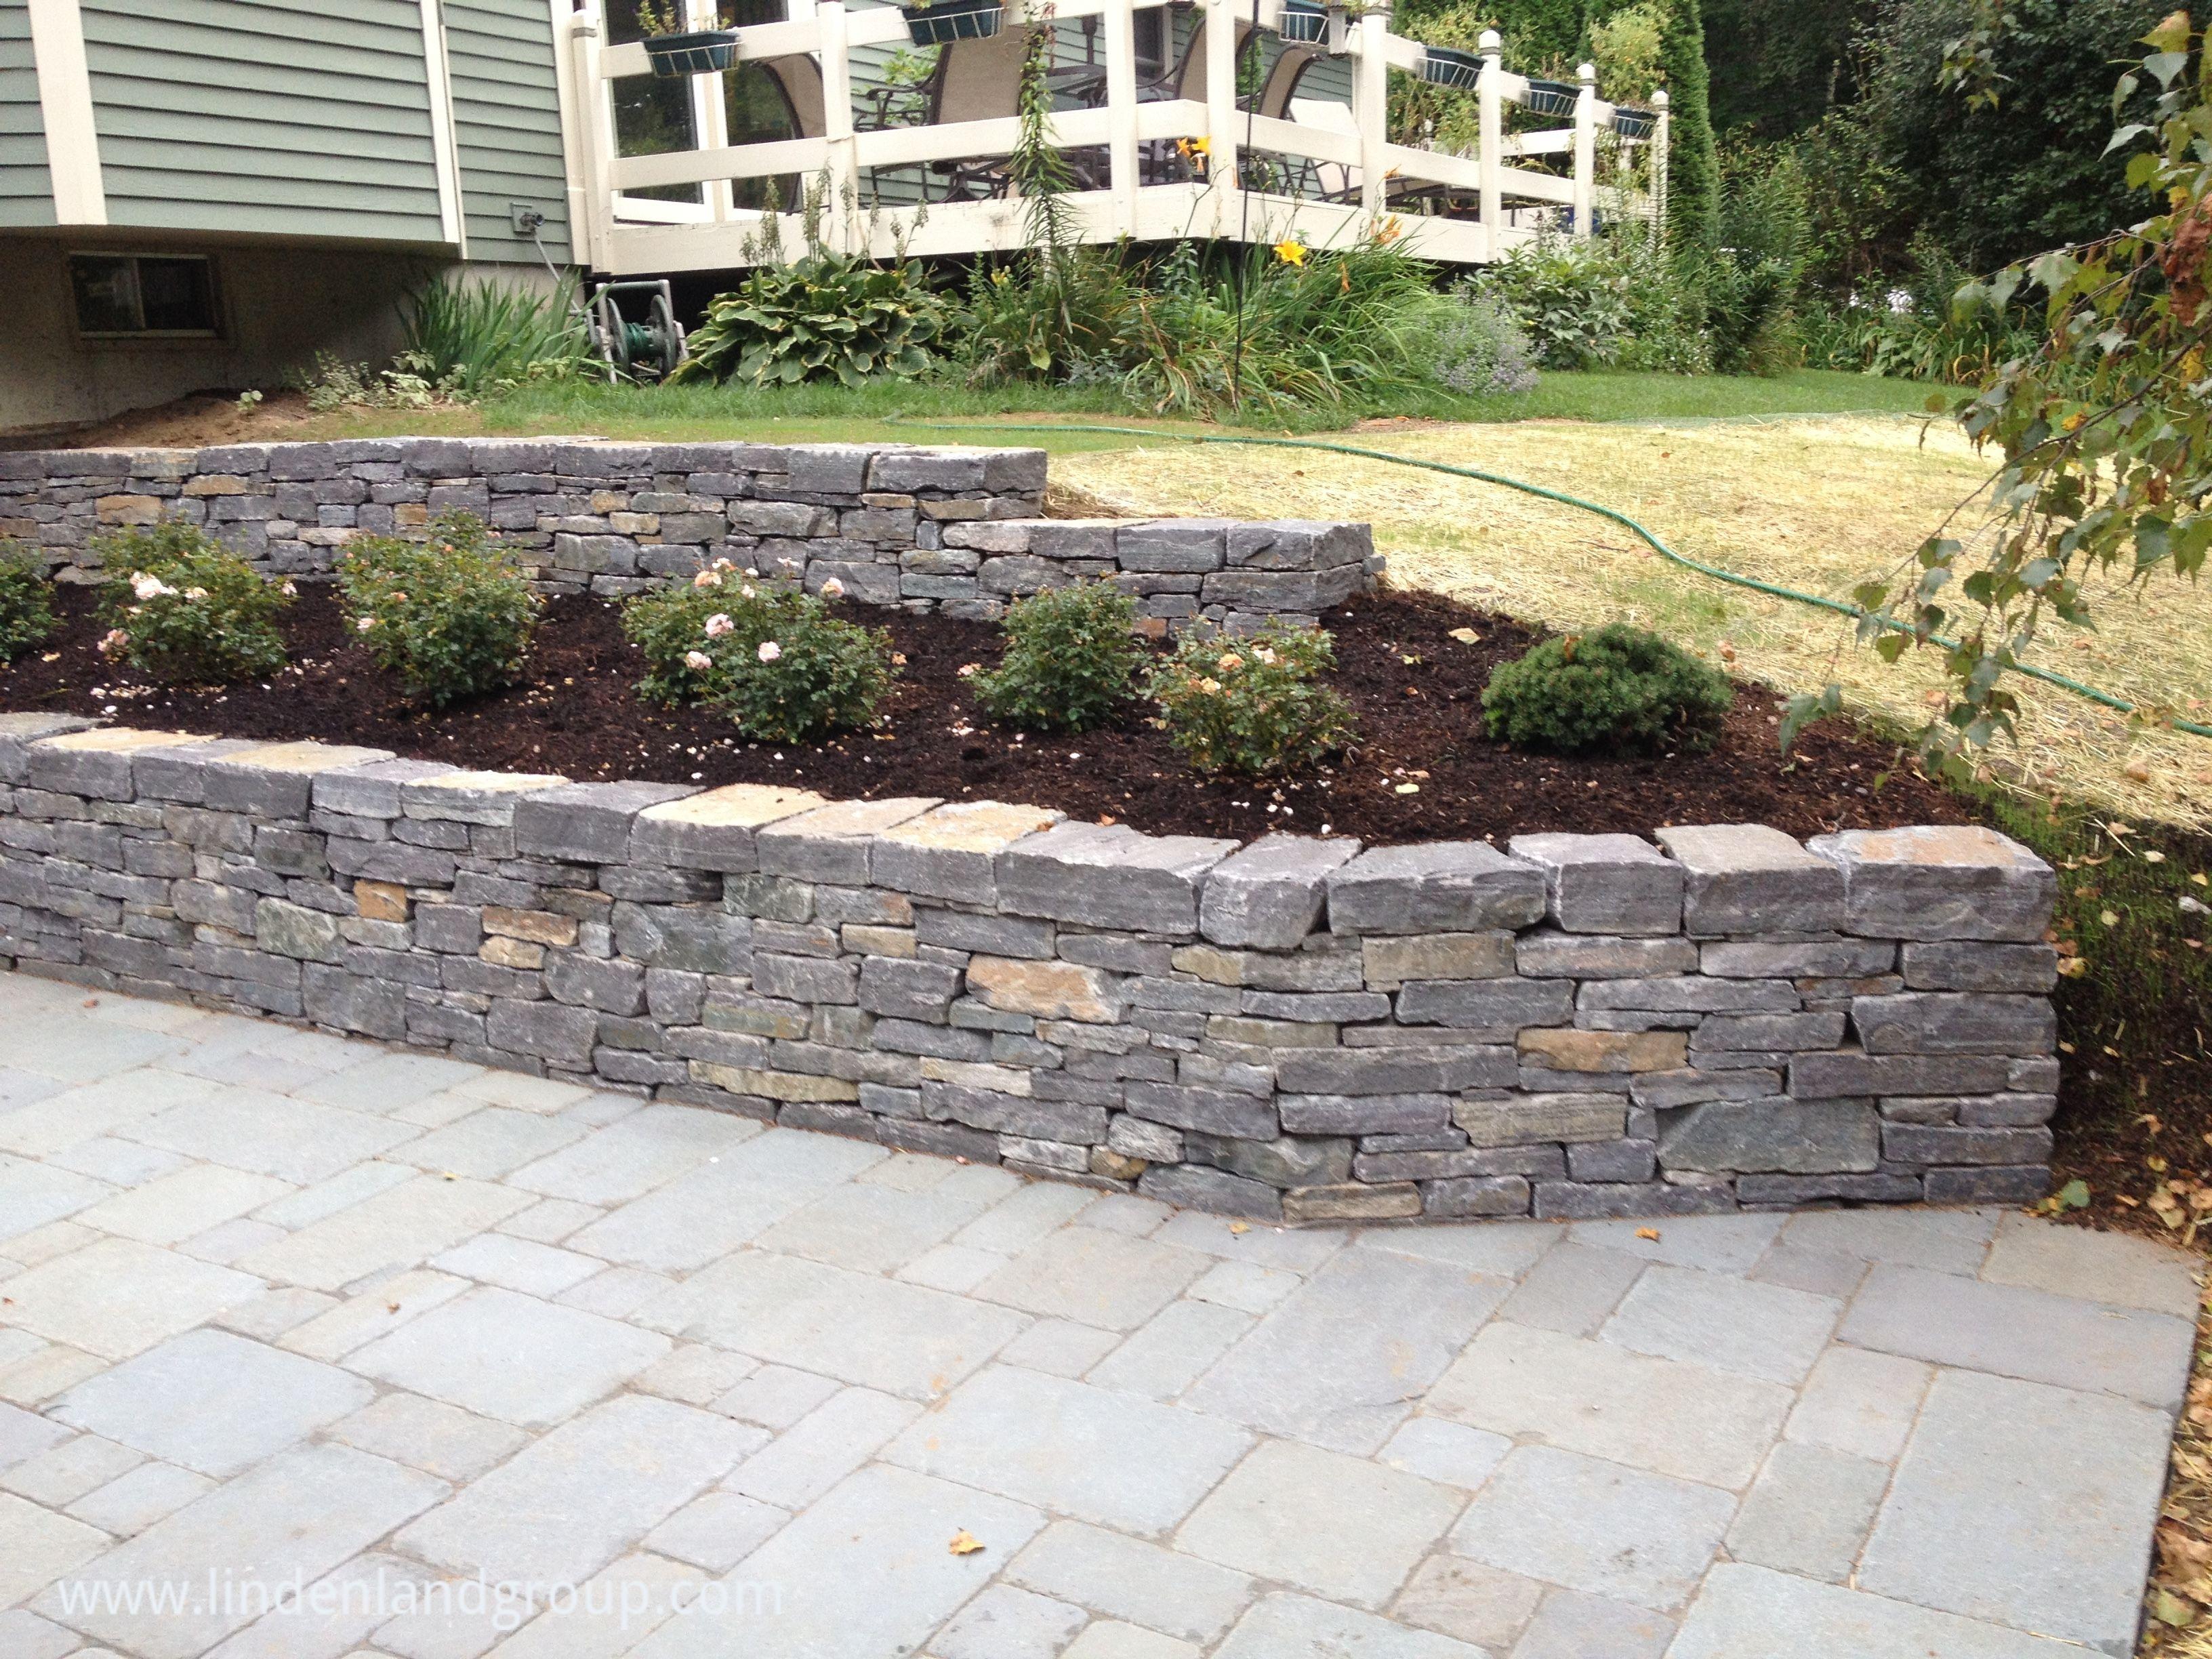 American Granite Retaining Walls And Tumbled Bluestone Patio In Shelburne Vermont Diy Patio Patio Stones Concrete Patio Makeover